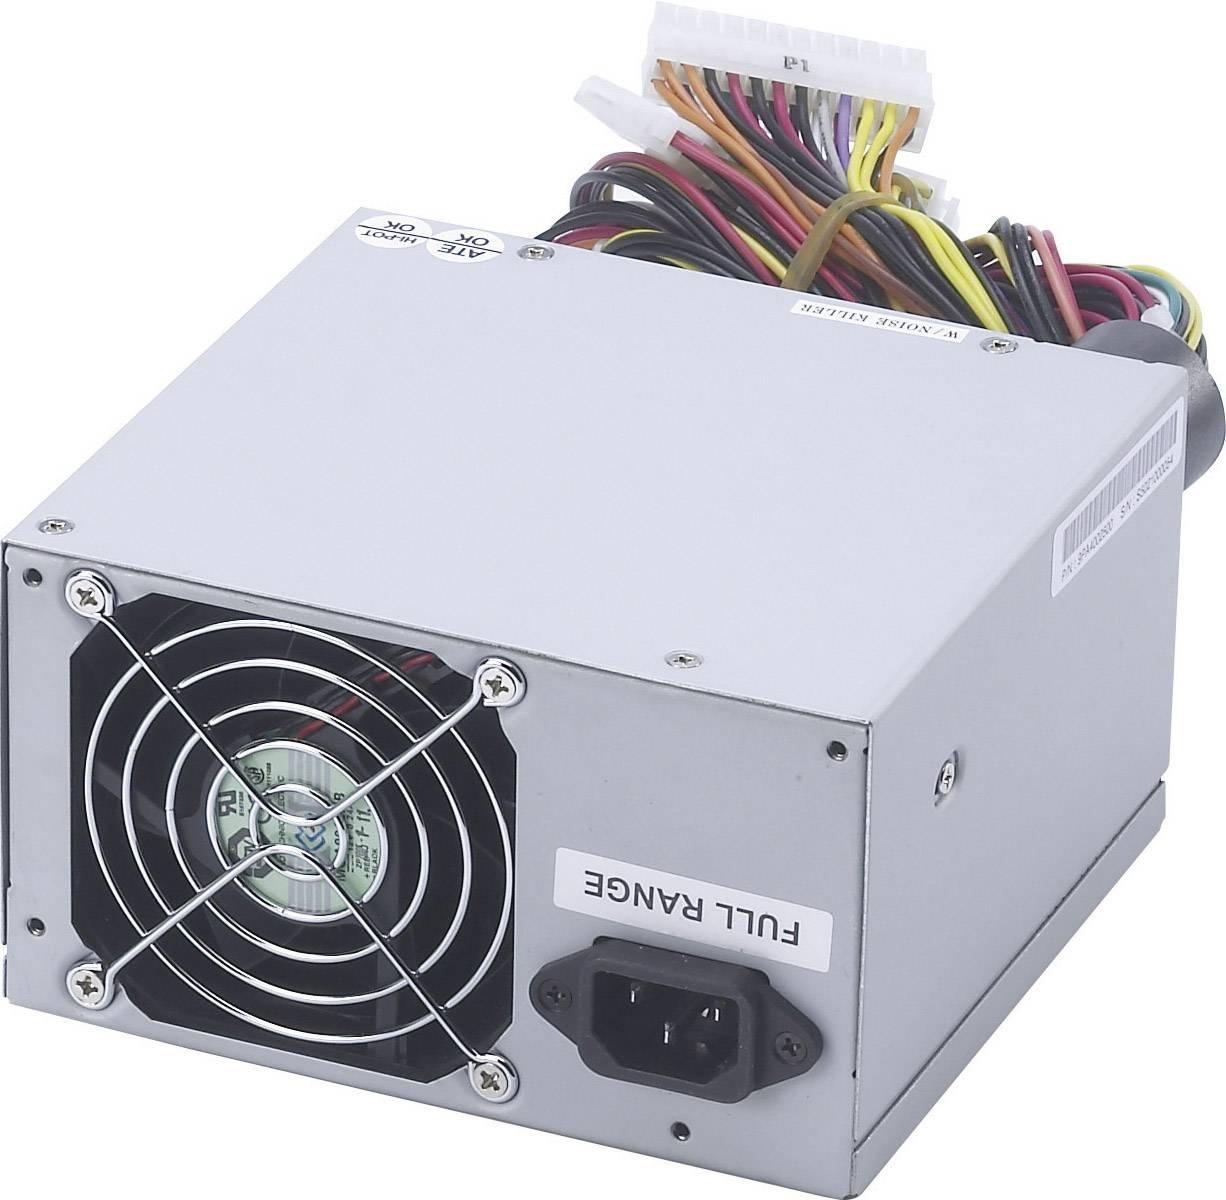 FSP400-70MP FSP Group 400W ATX Medical-Grade Power Supply